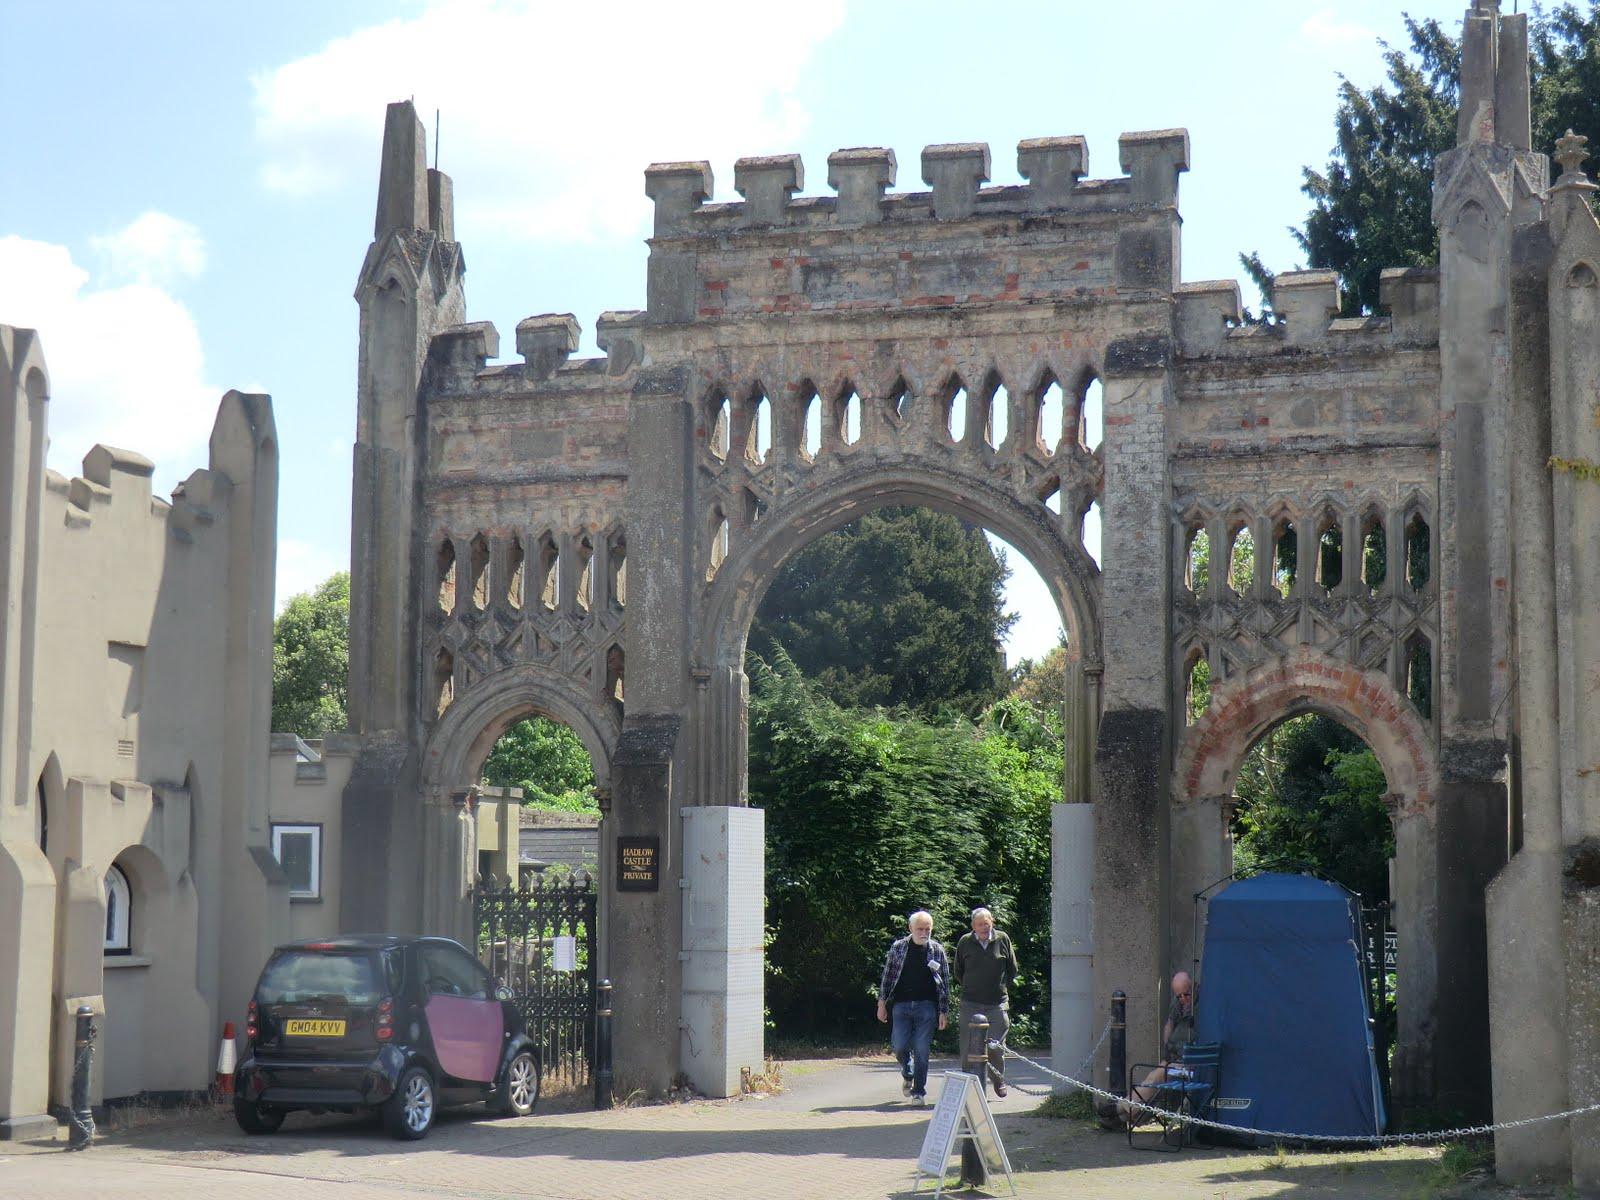 CIMG1117 Entrance to Hadlow Castle